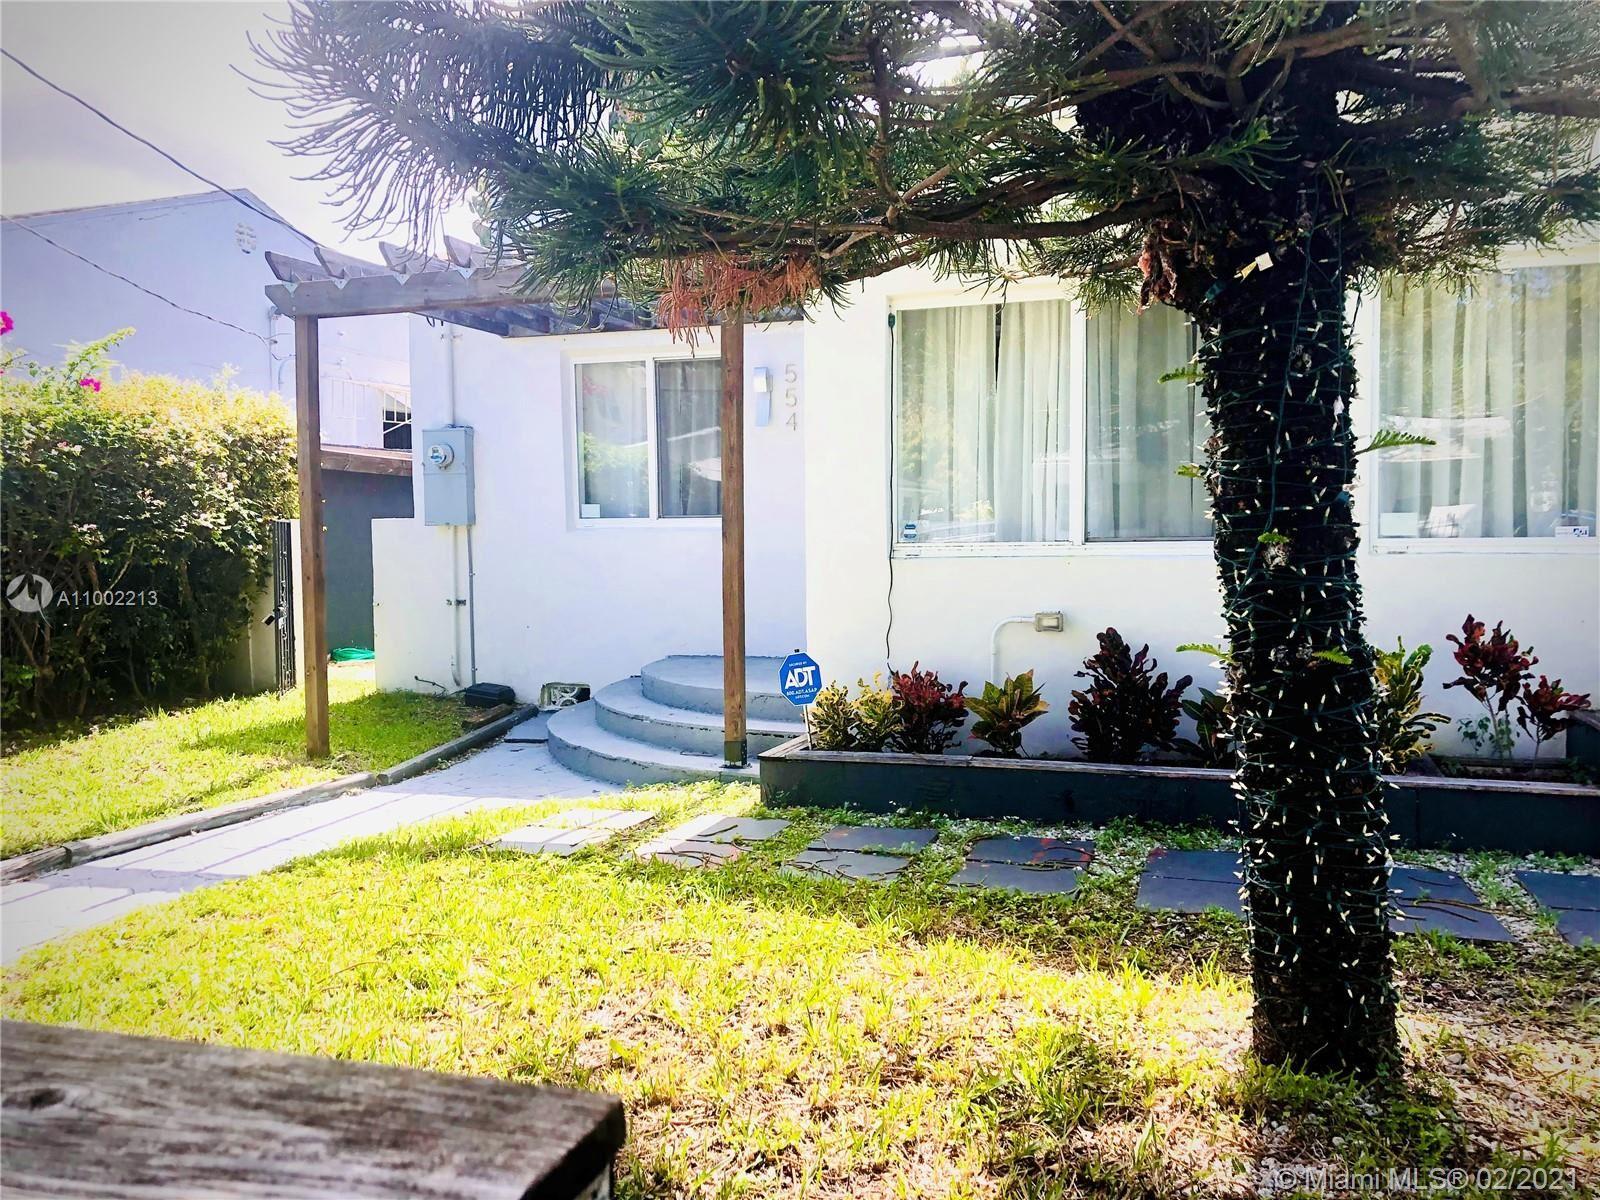 554 NW 41st St, Miami, FL 33127 - #: A11002213